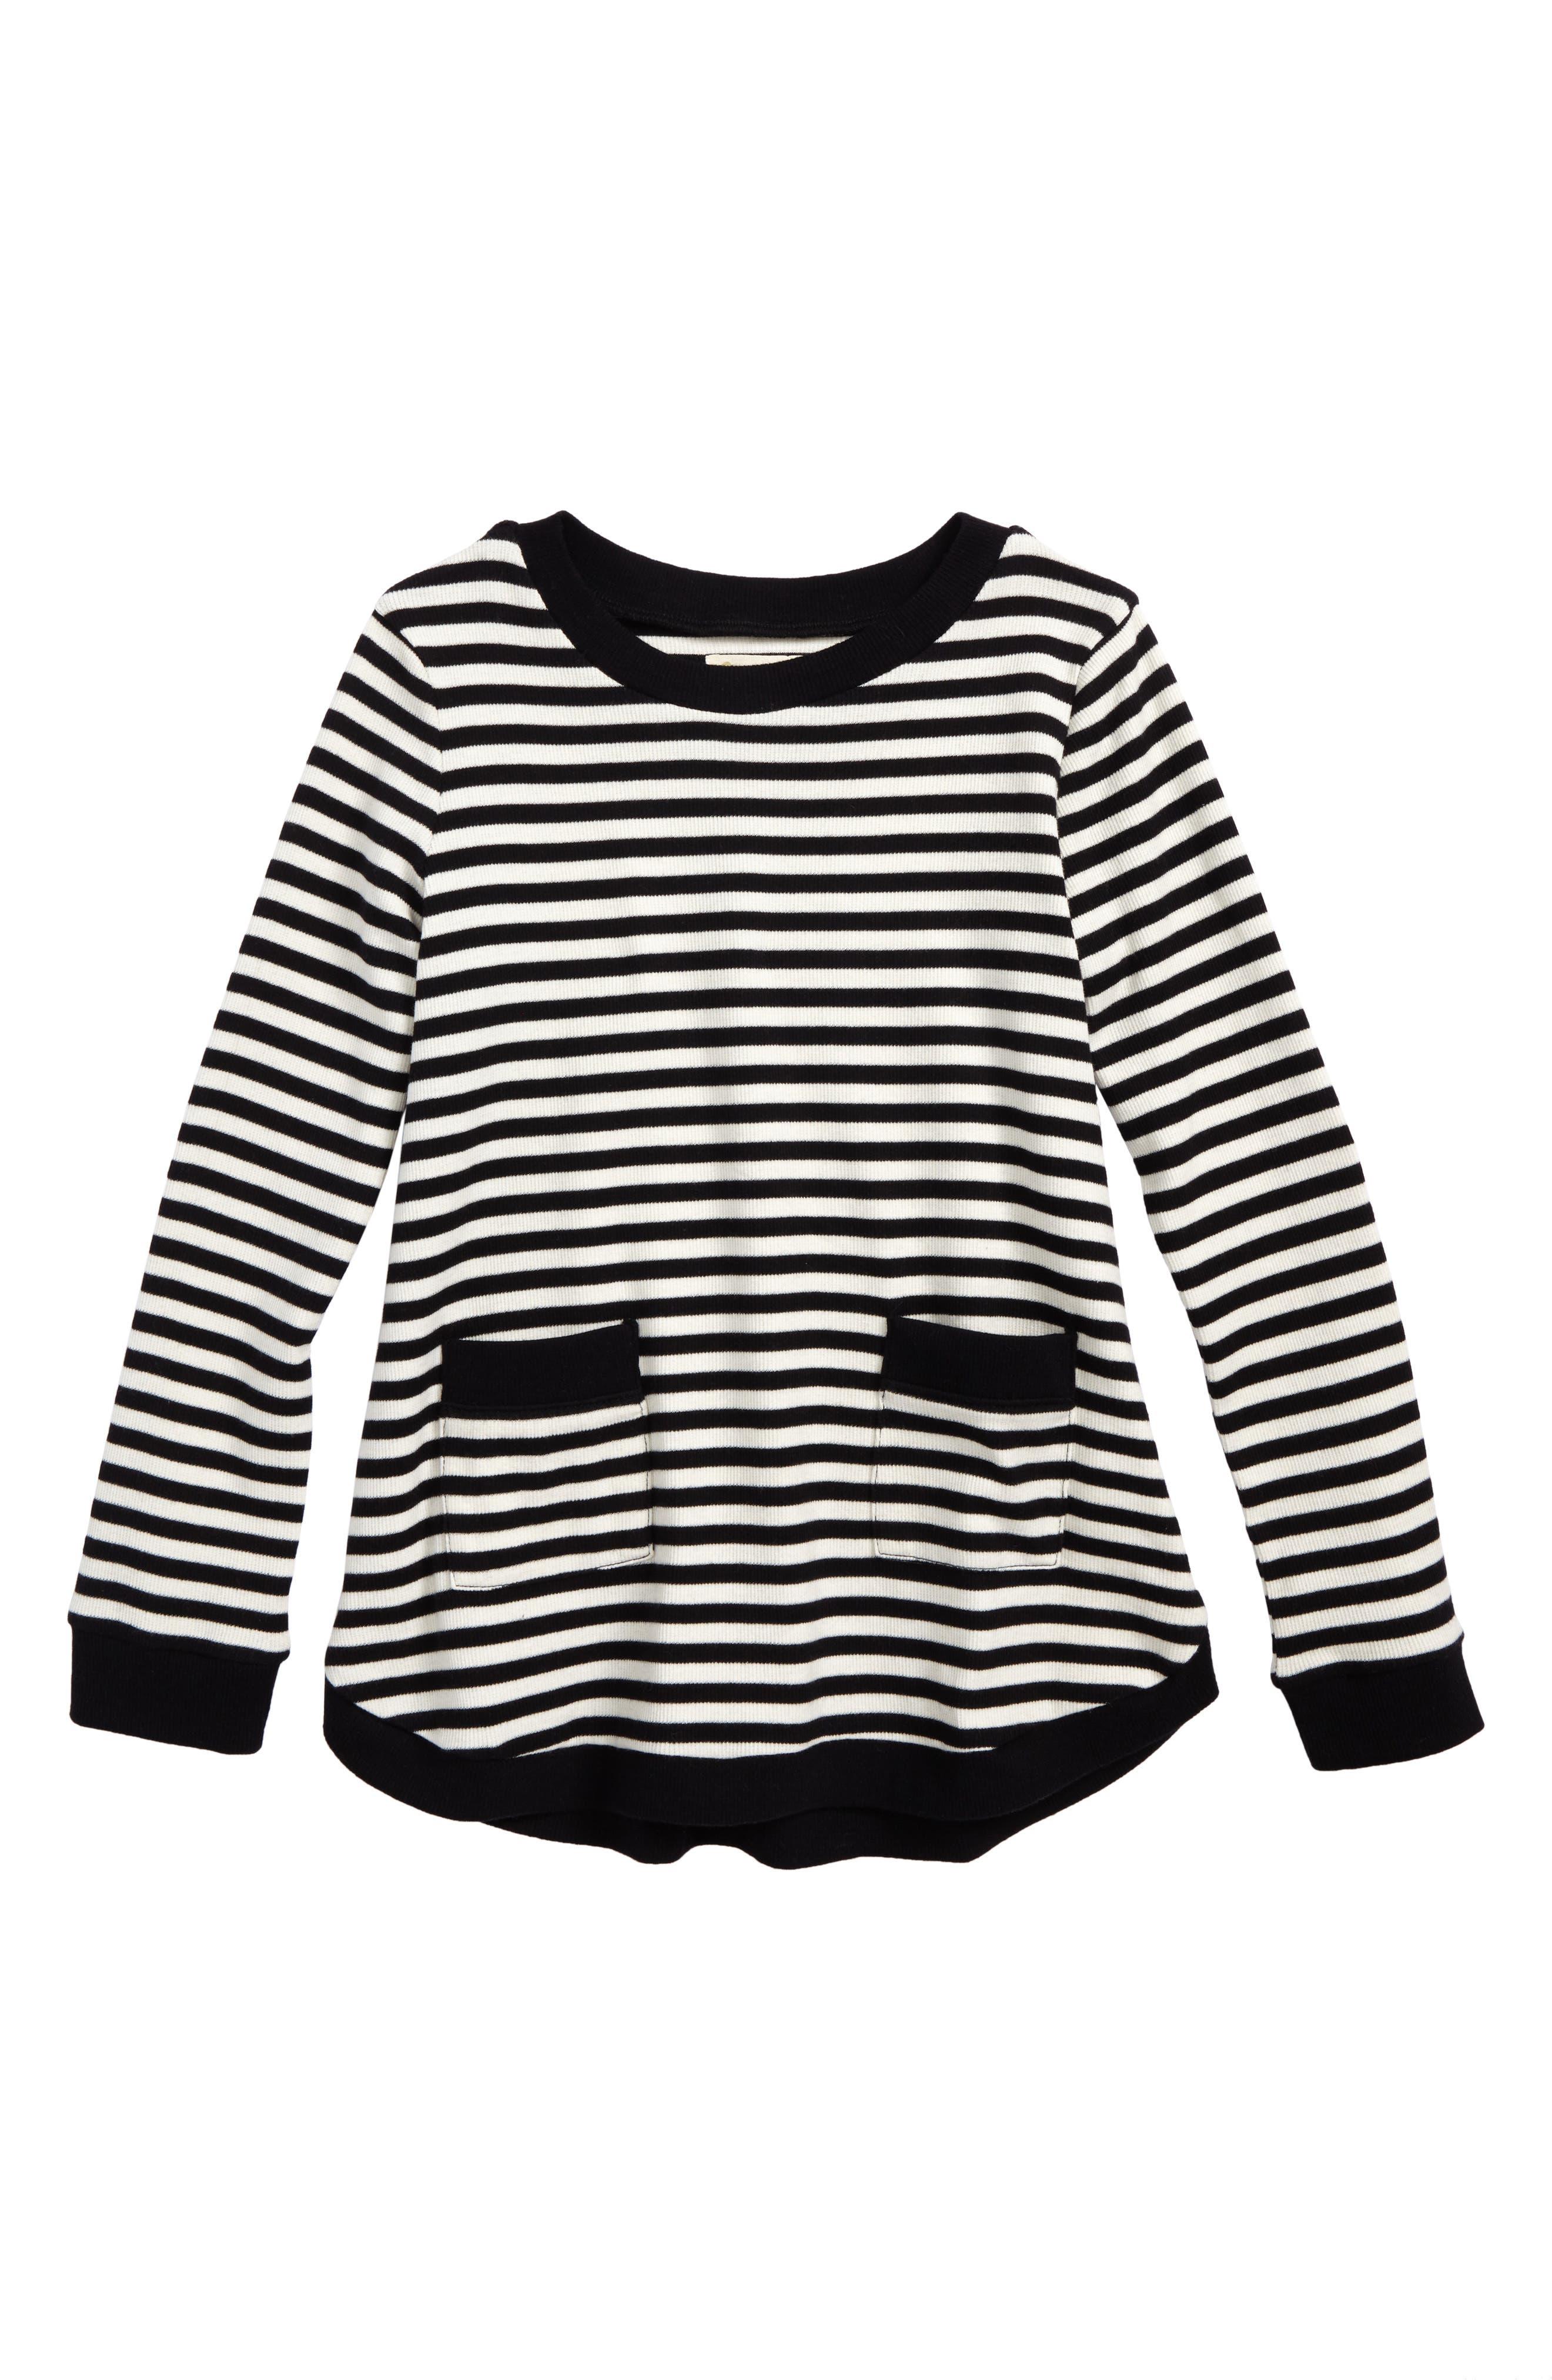 Heart Elbow Patch Stripe Tunic Top,                             Main thumbnail 1, color,                             Black Rock- Ivory Stripe